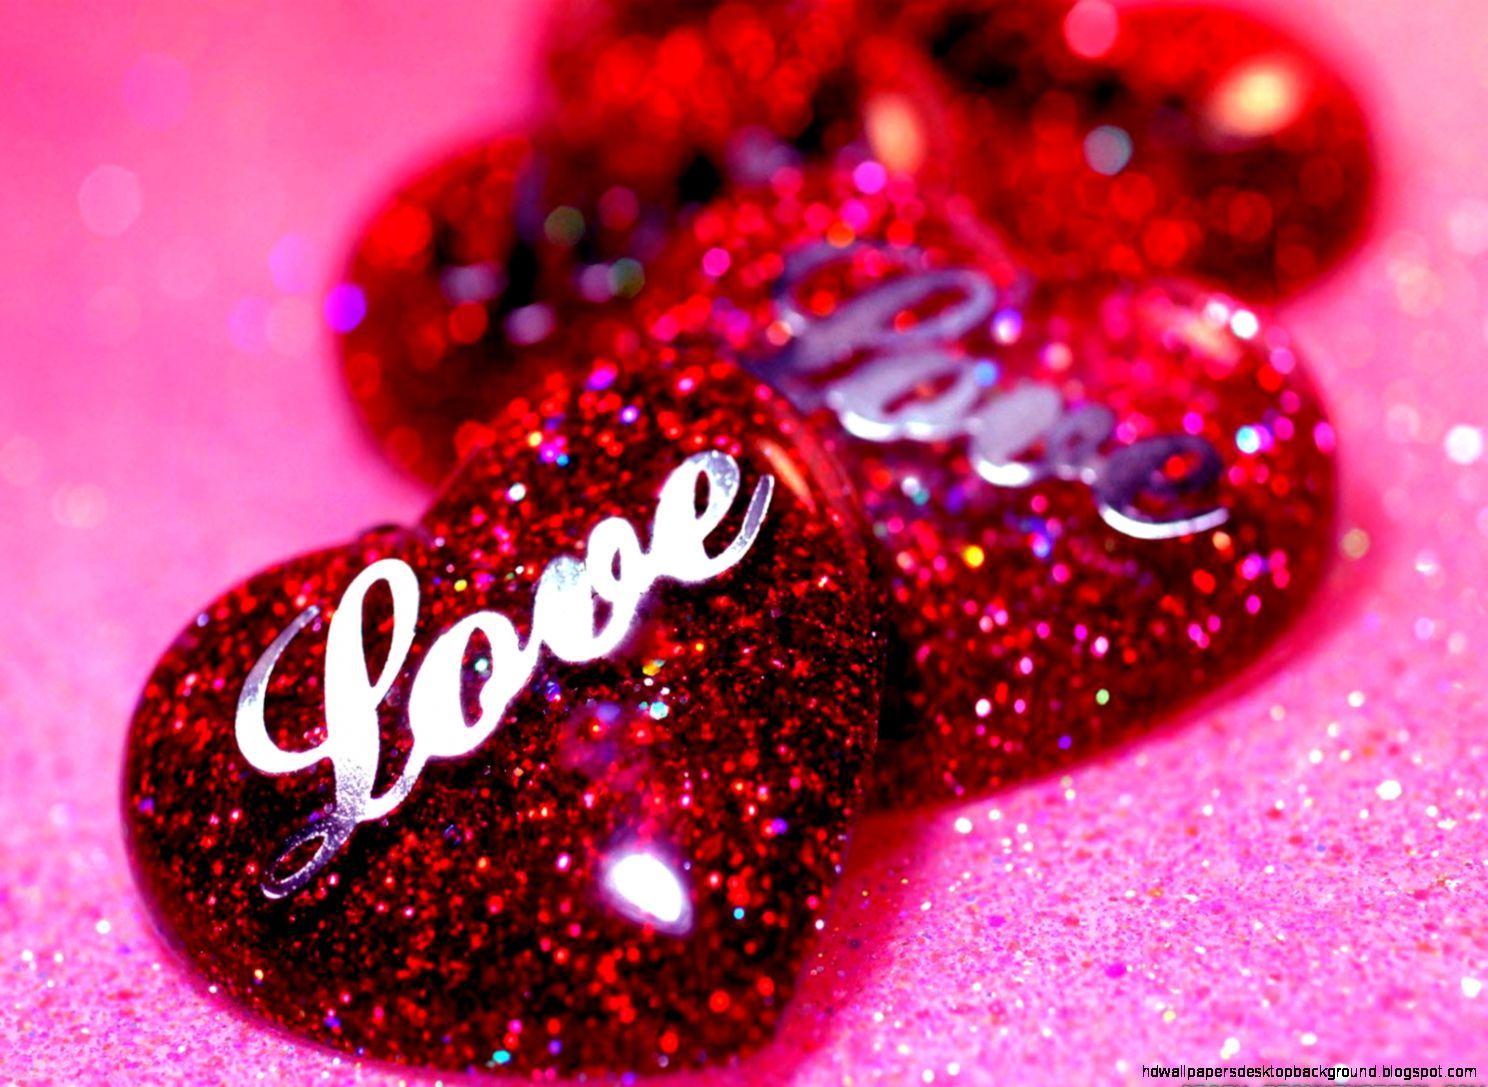 Must see Wallpaper Love Beautiful - 056eada05fc6498d5a014b162bc20cd1  Perfect Image Reference_43223.jpg